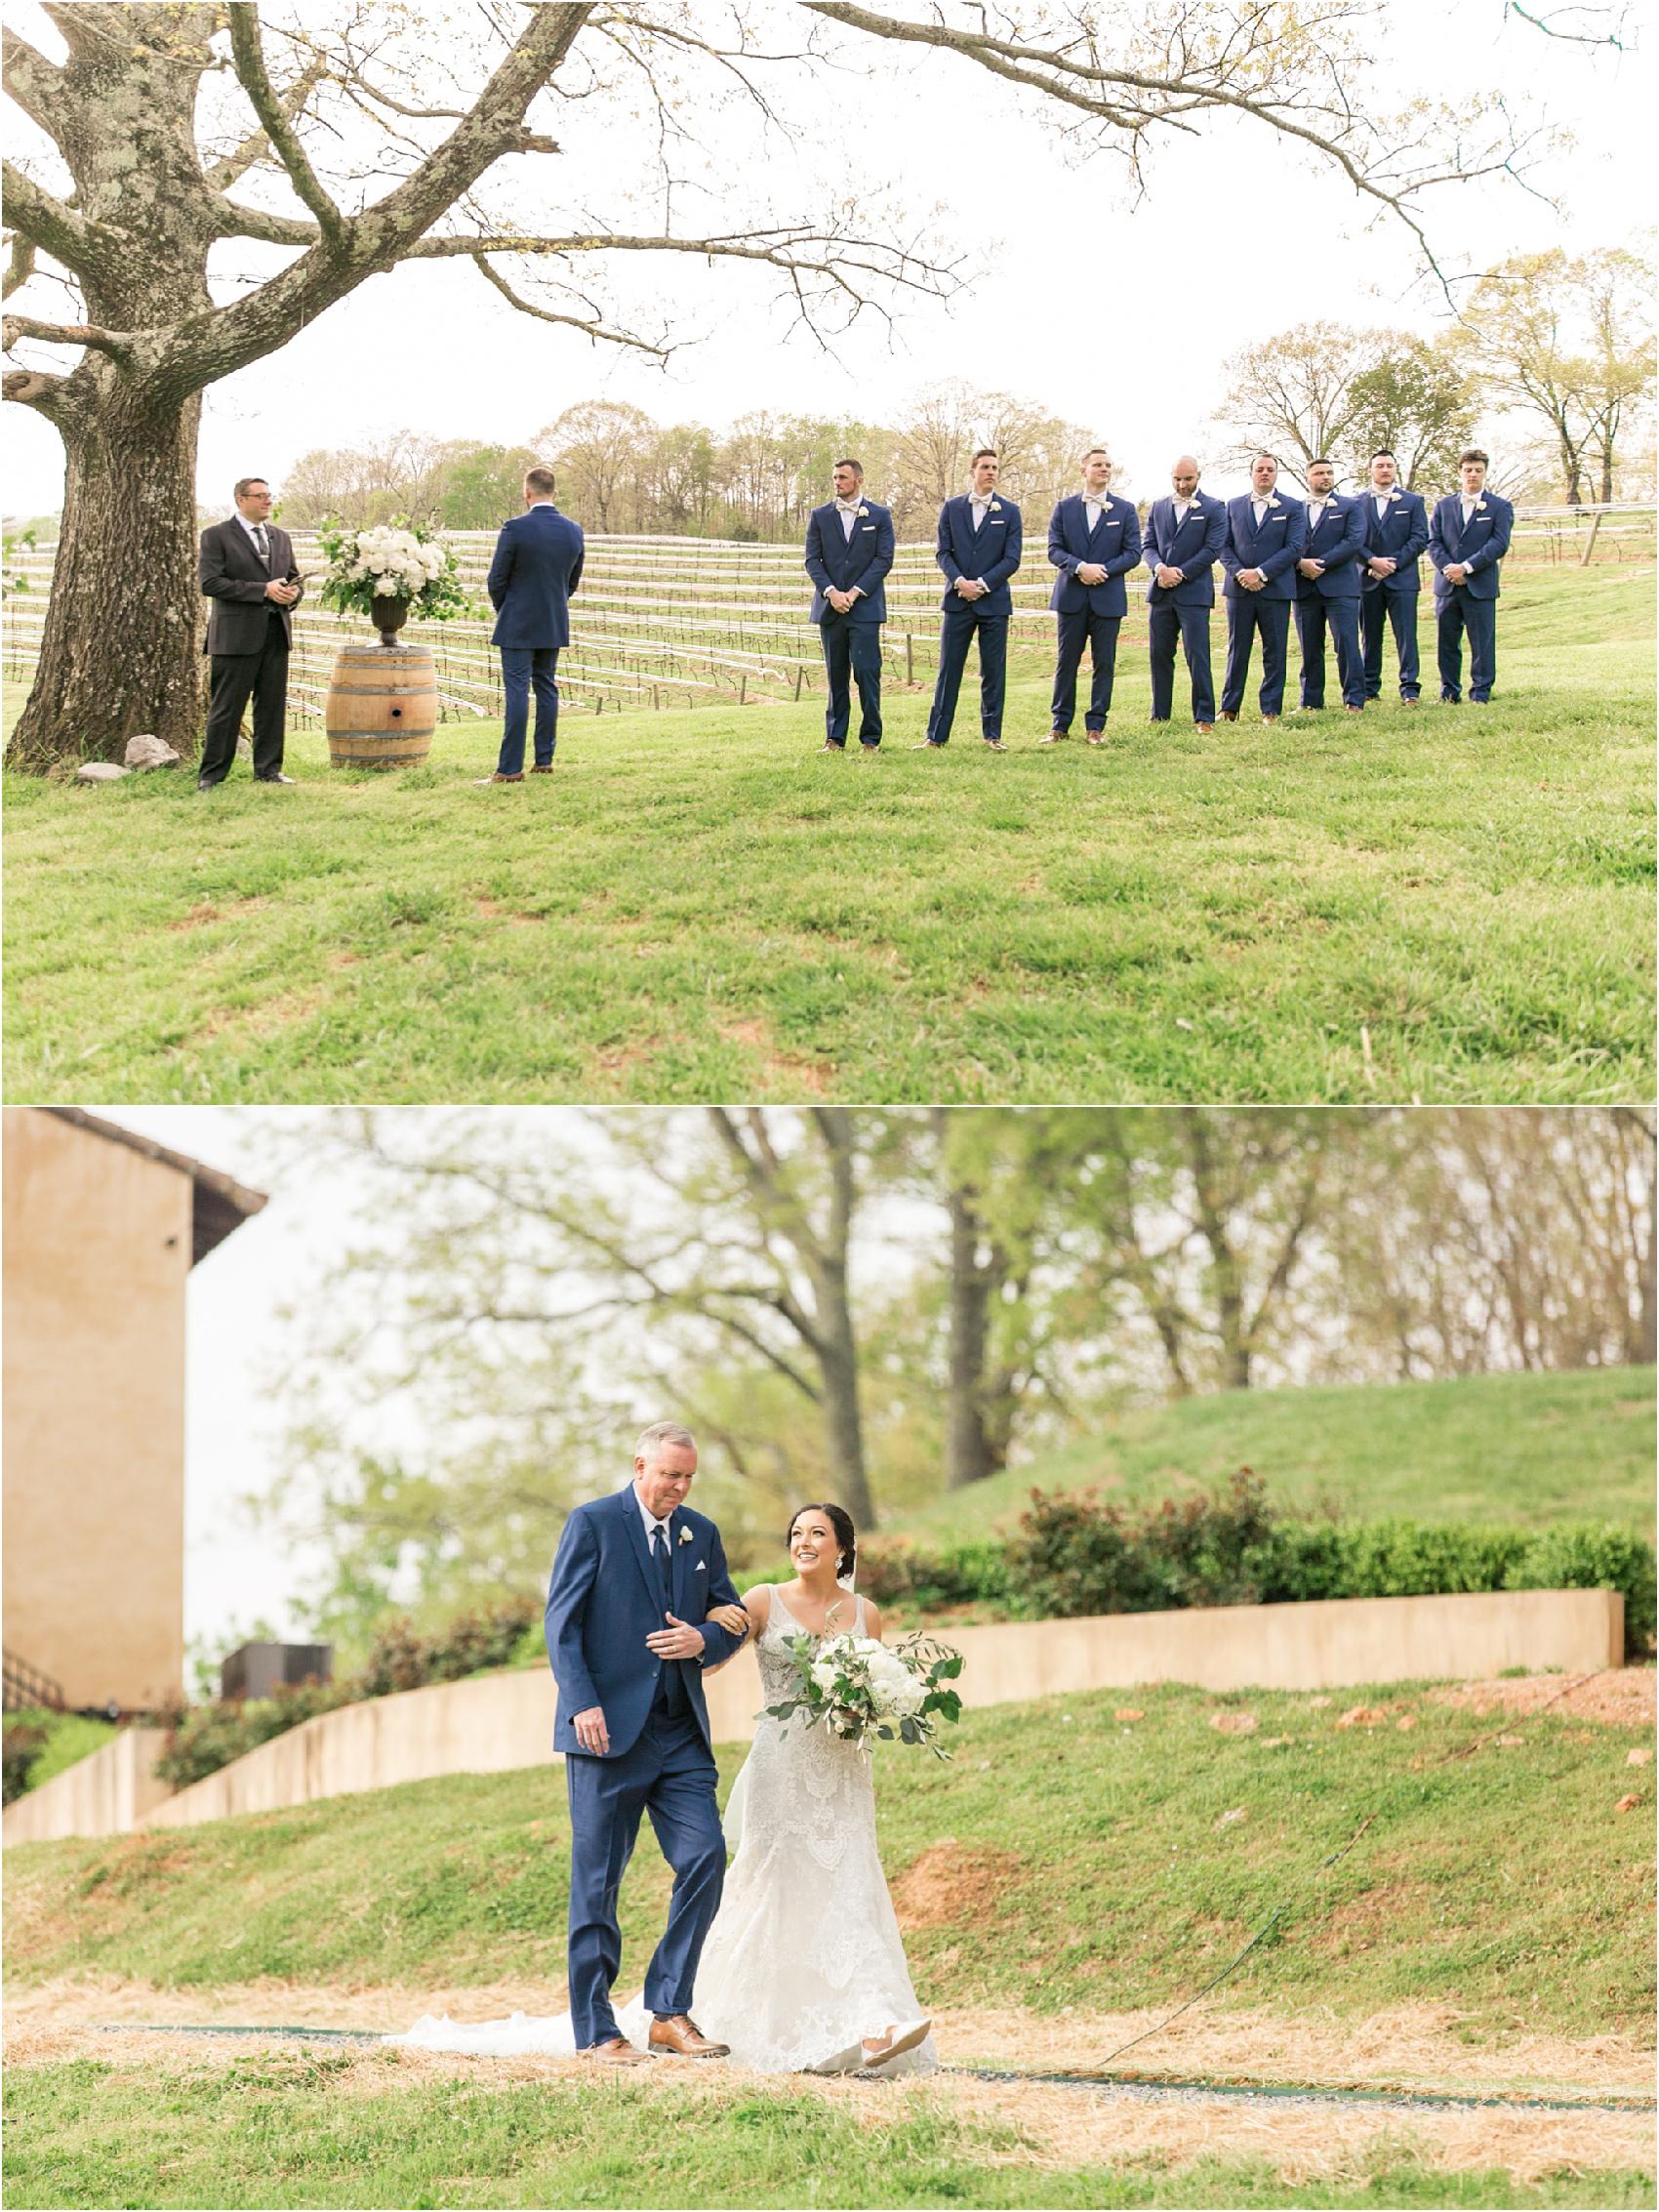 Savannah Eve Photography- Turnbill-Gilgan Wedding- Blog-30.jpg